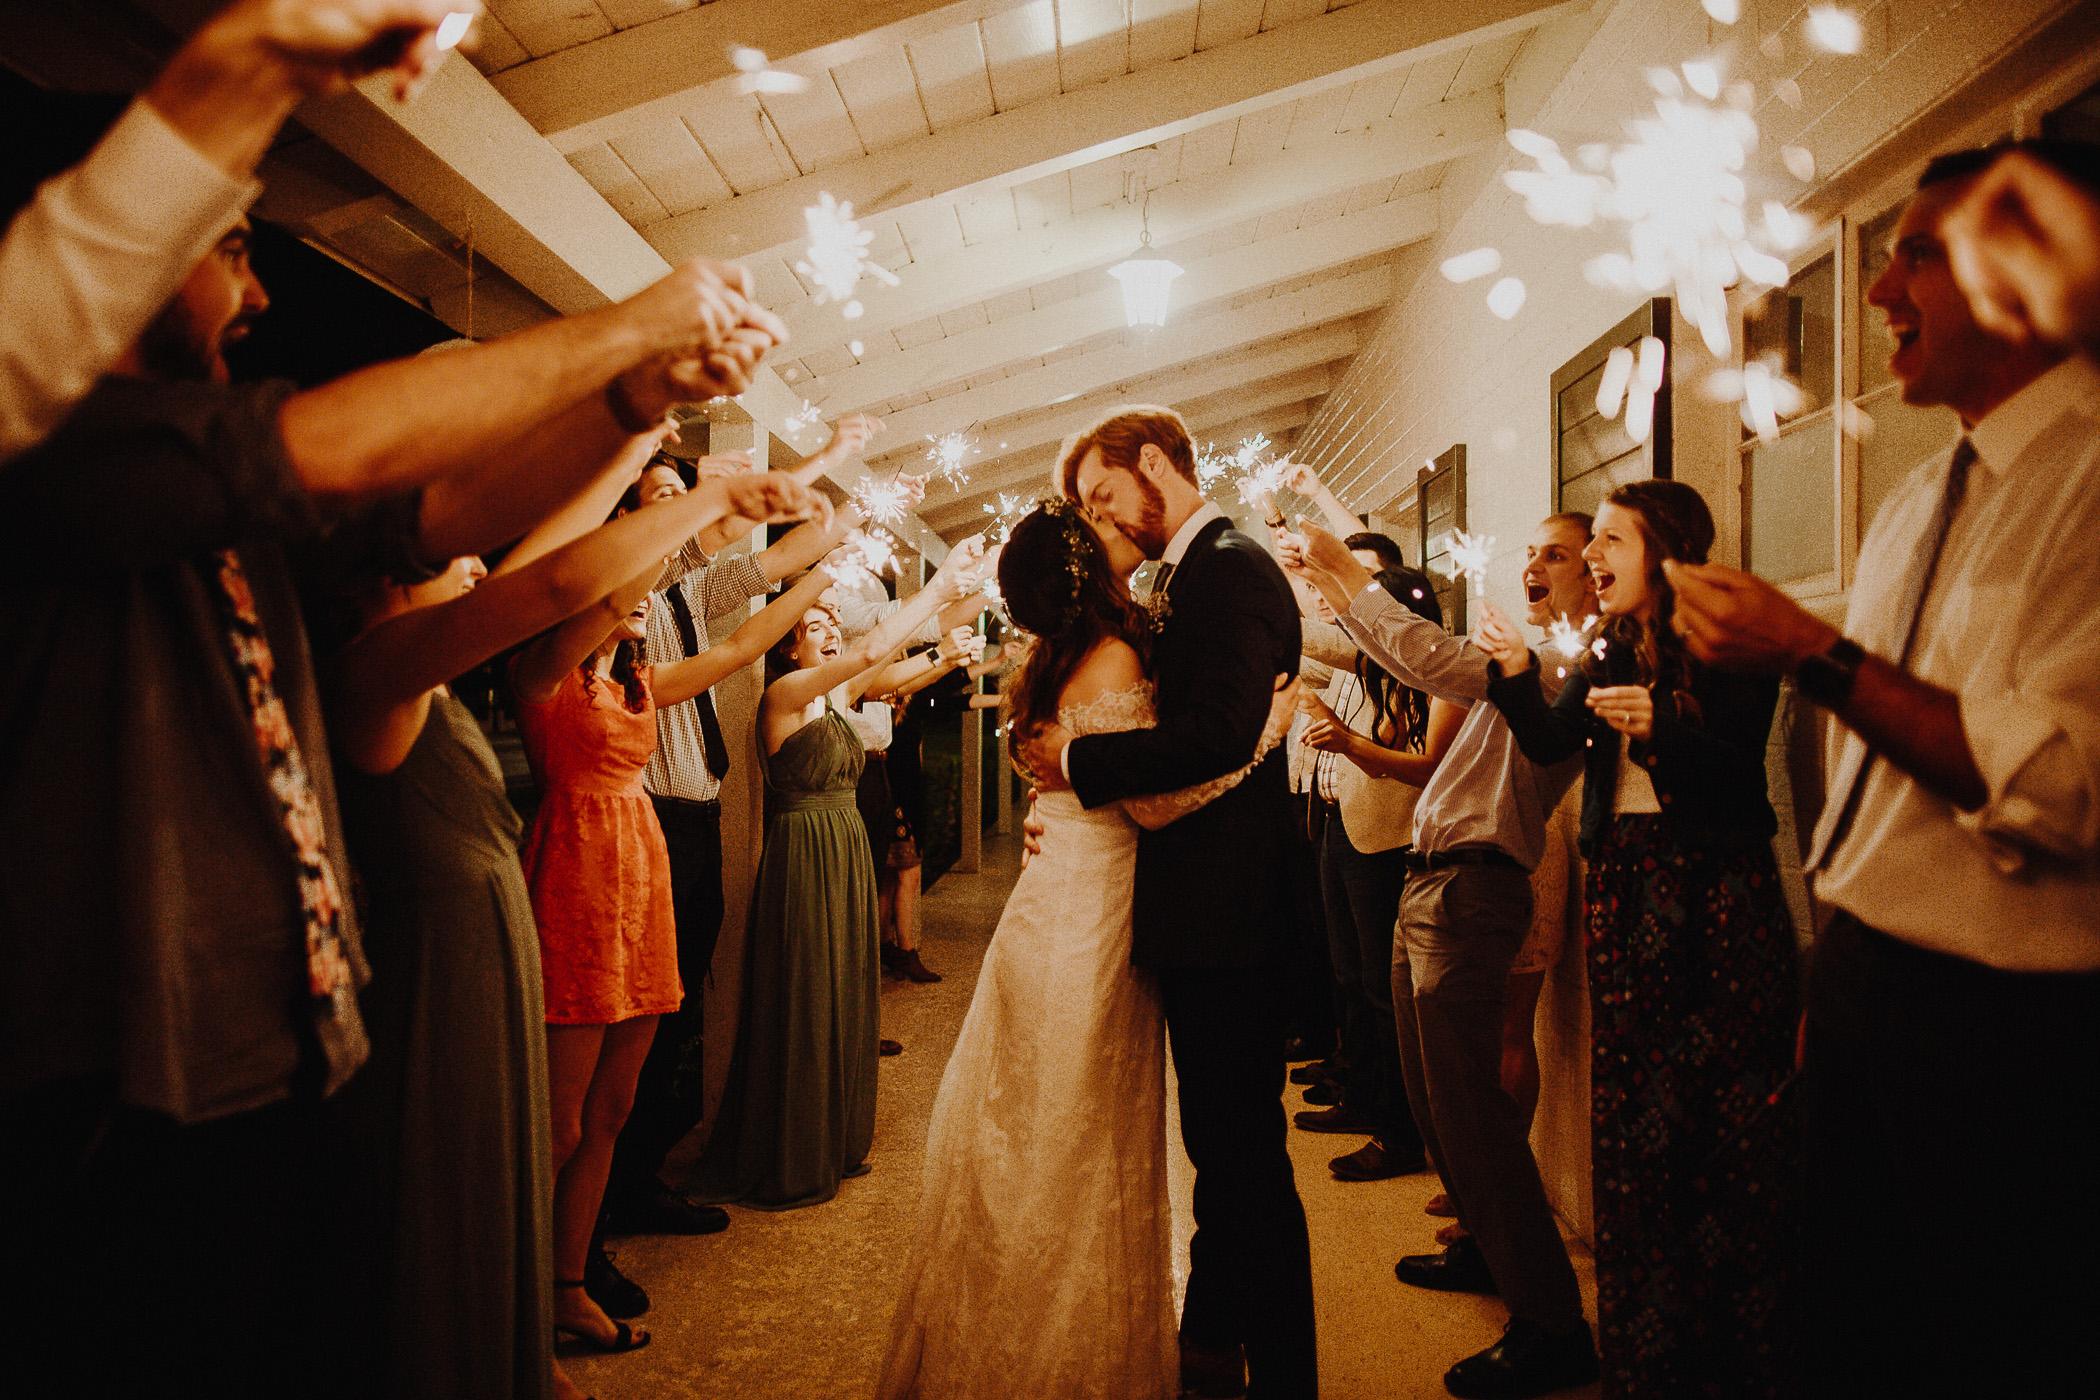 181104-Luxium-Weddings-Arizona-@matt__Le-Brandon-Kariana-Phoenix-Valley-Garden-Center-1154.jpg